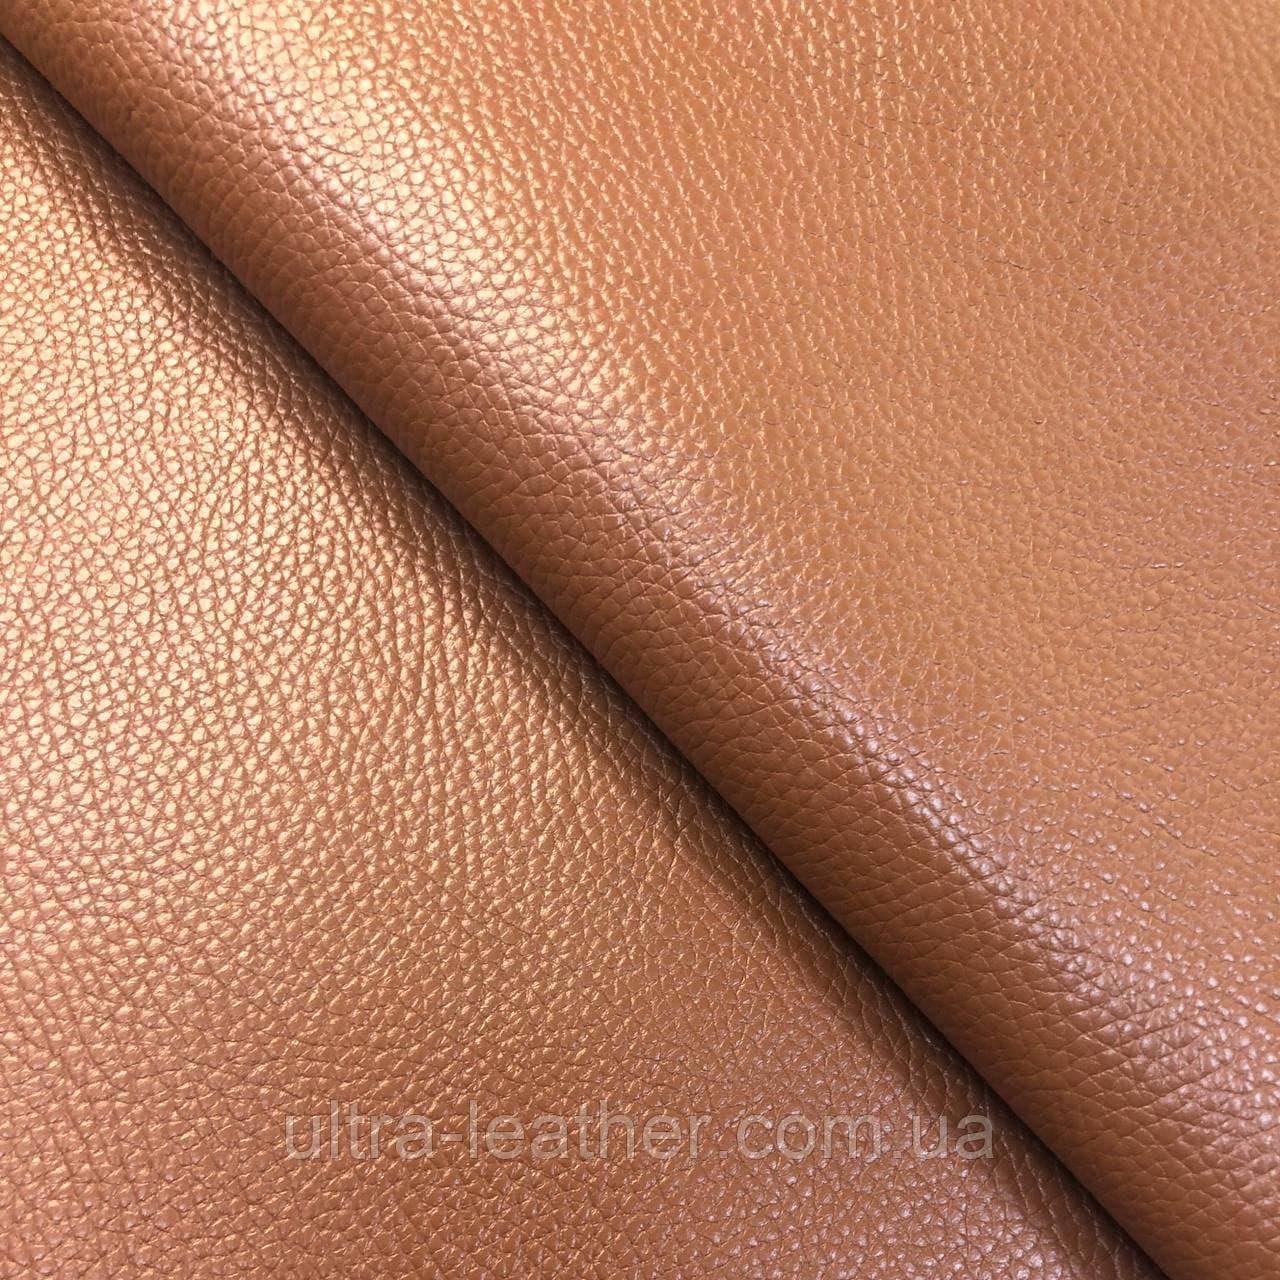 Натуральная галантерейная кожа  ФЛЕШ, Карамель, Pantone 17-1340